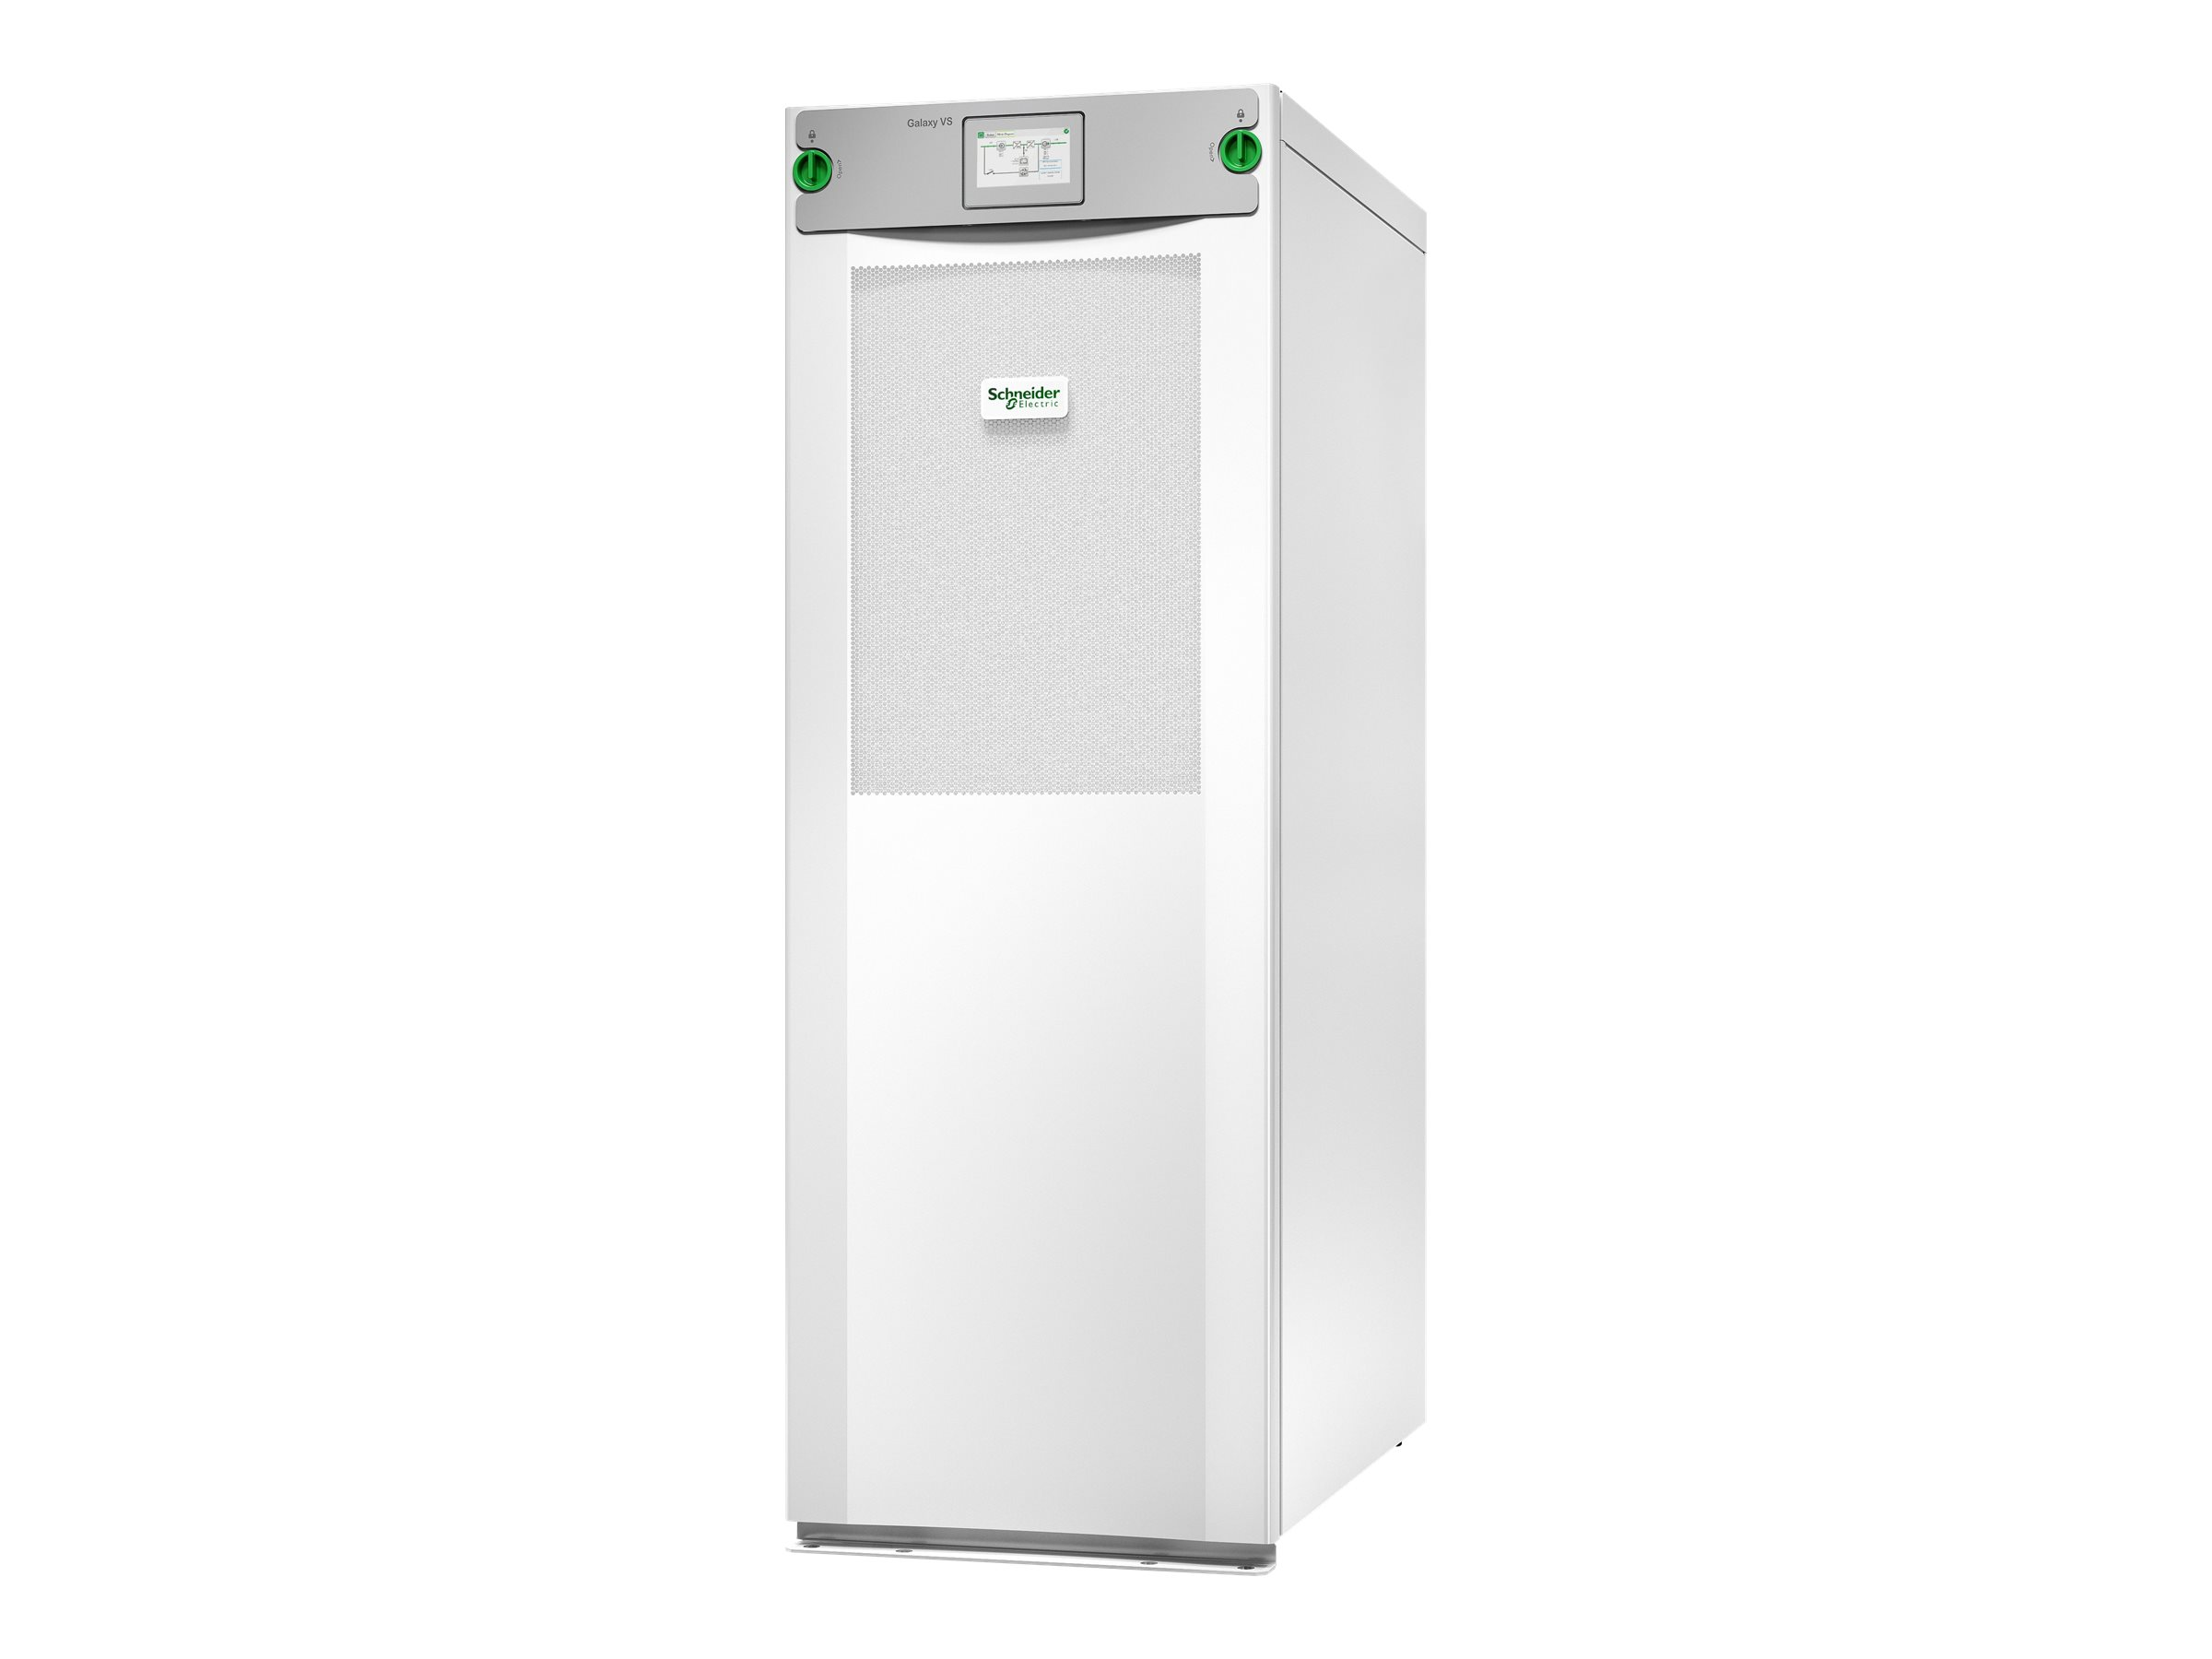 Schneider Electric Galaxy VS GVSUPS80KHS - USV - Wechselstrom 400 V - 80 kW - 80000 VA - 3 Phasen